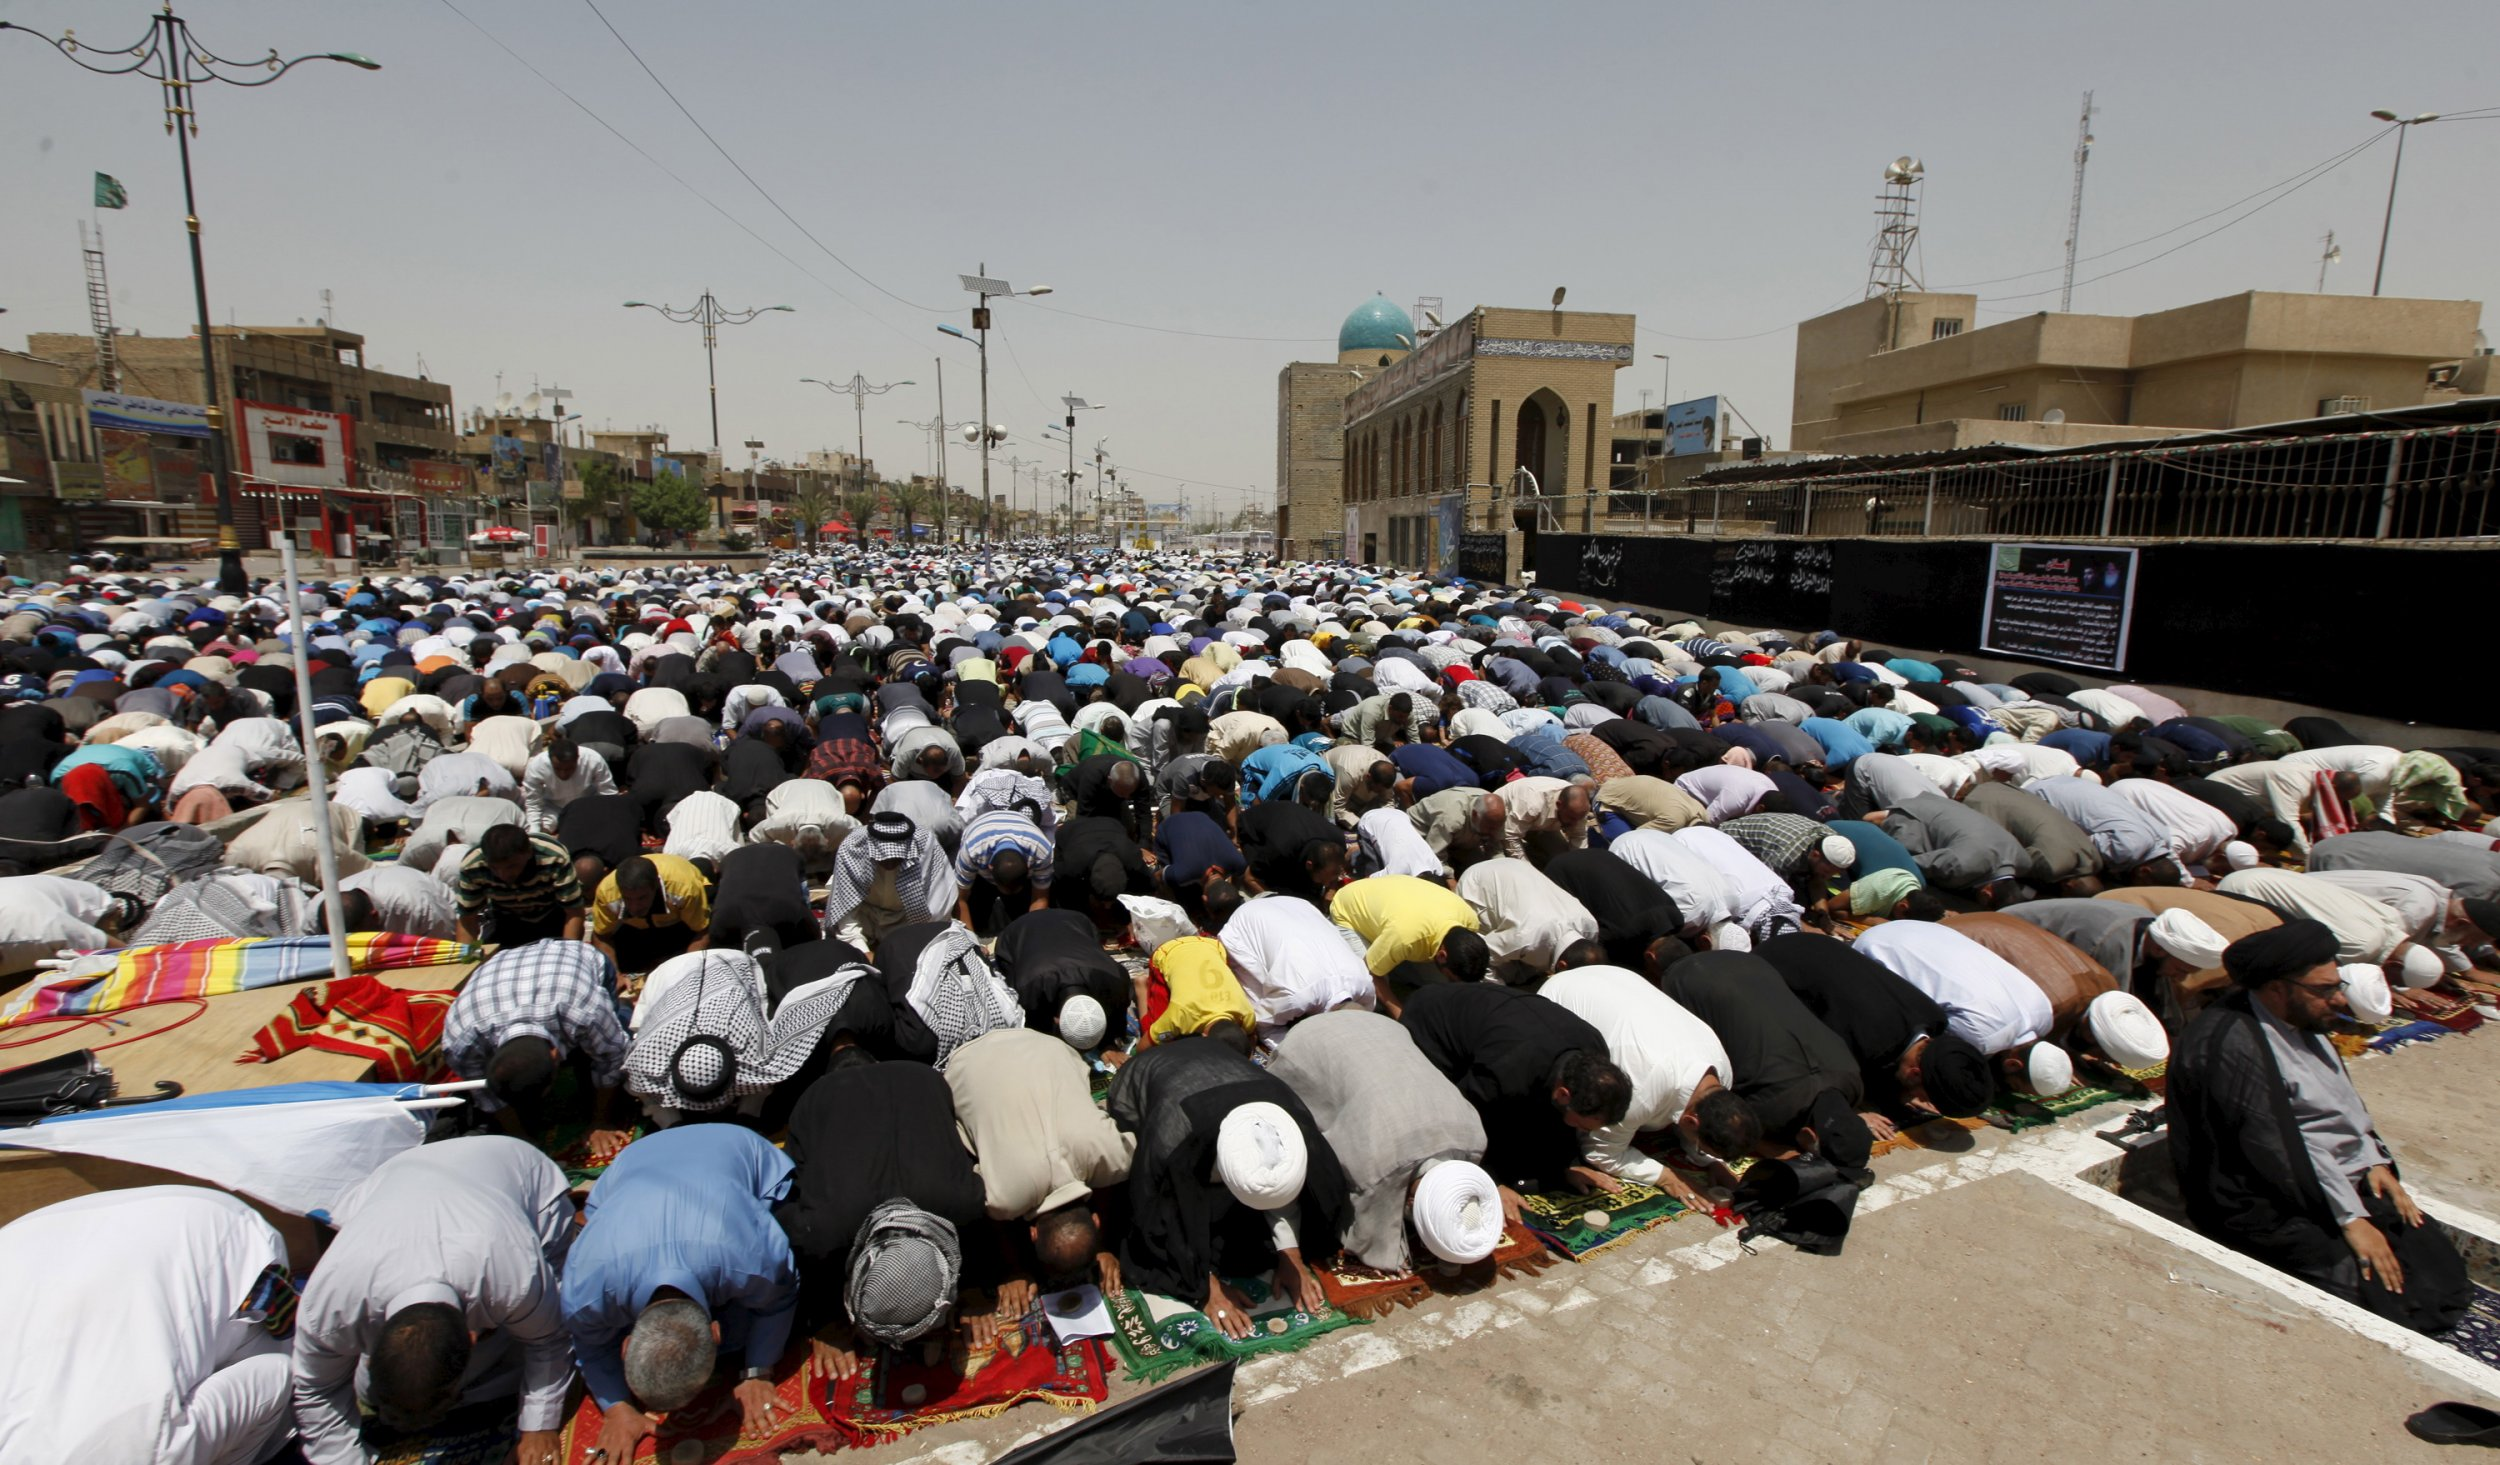 8/13/2015_BaghdadExplosion